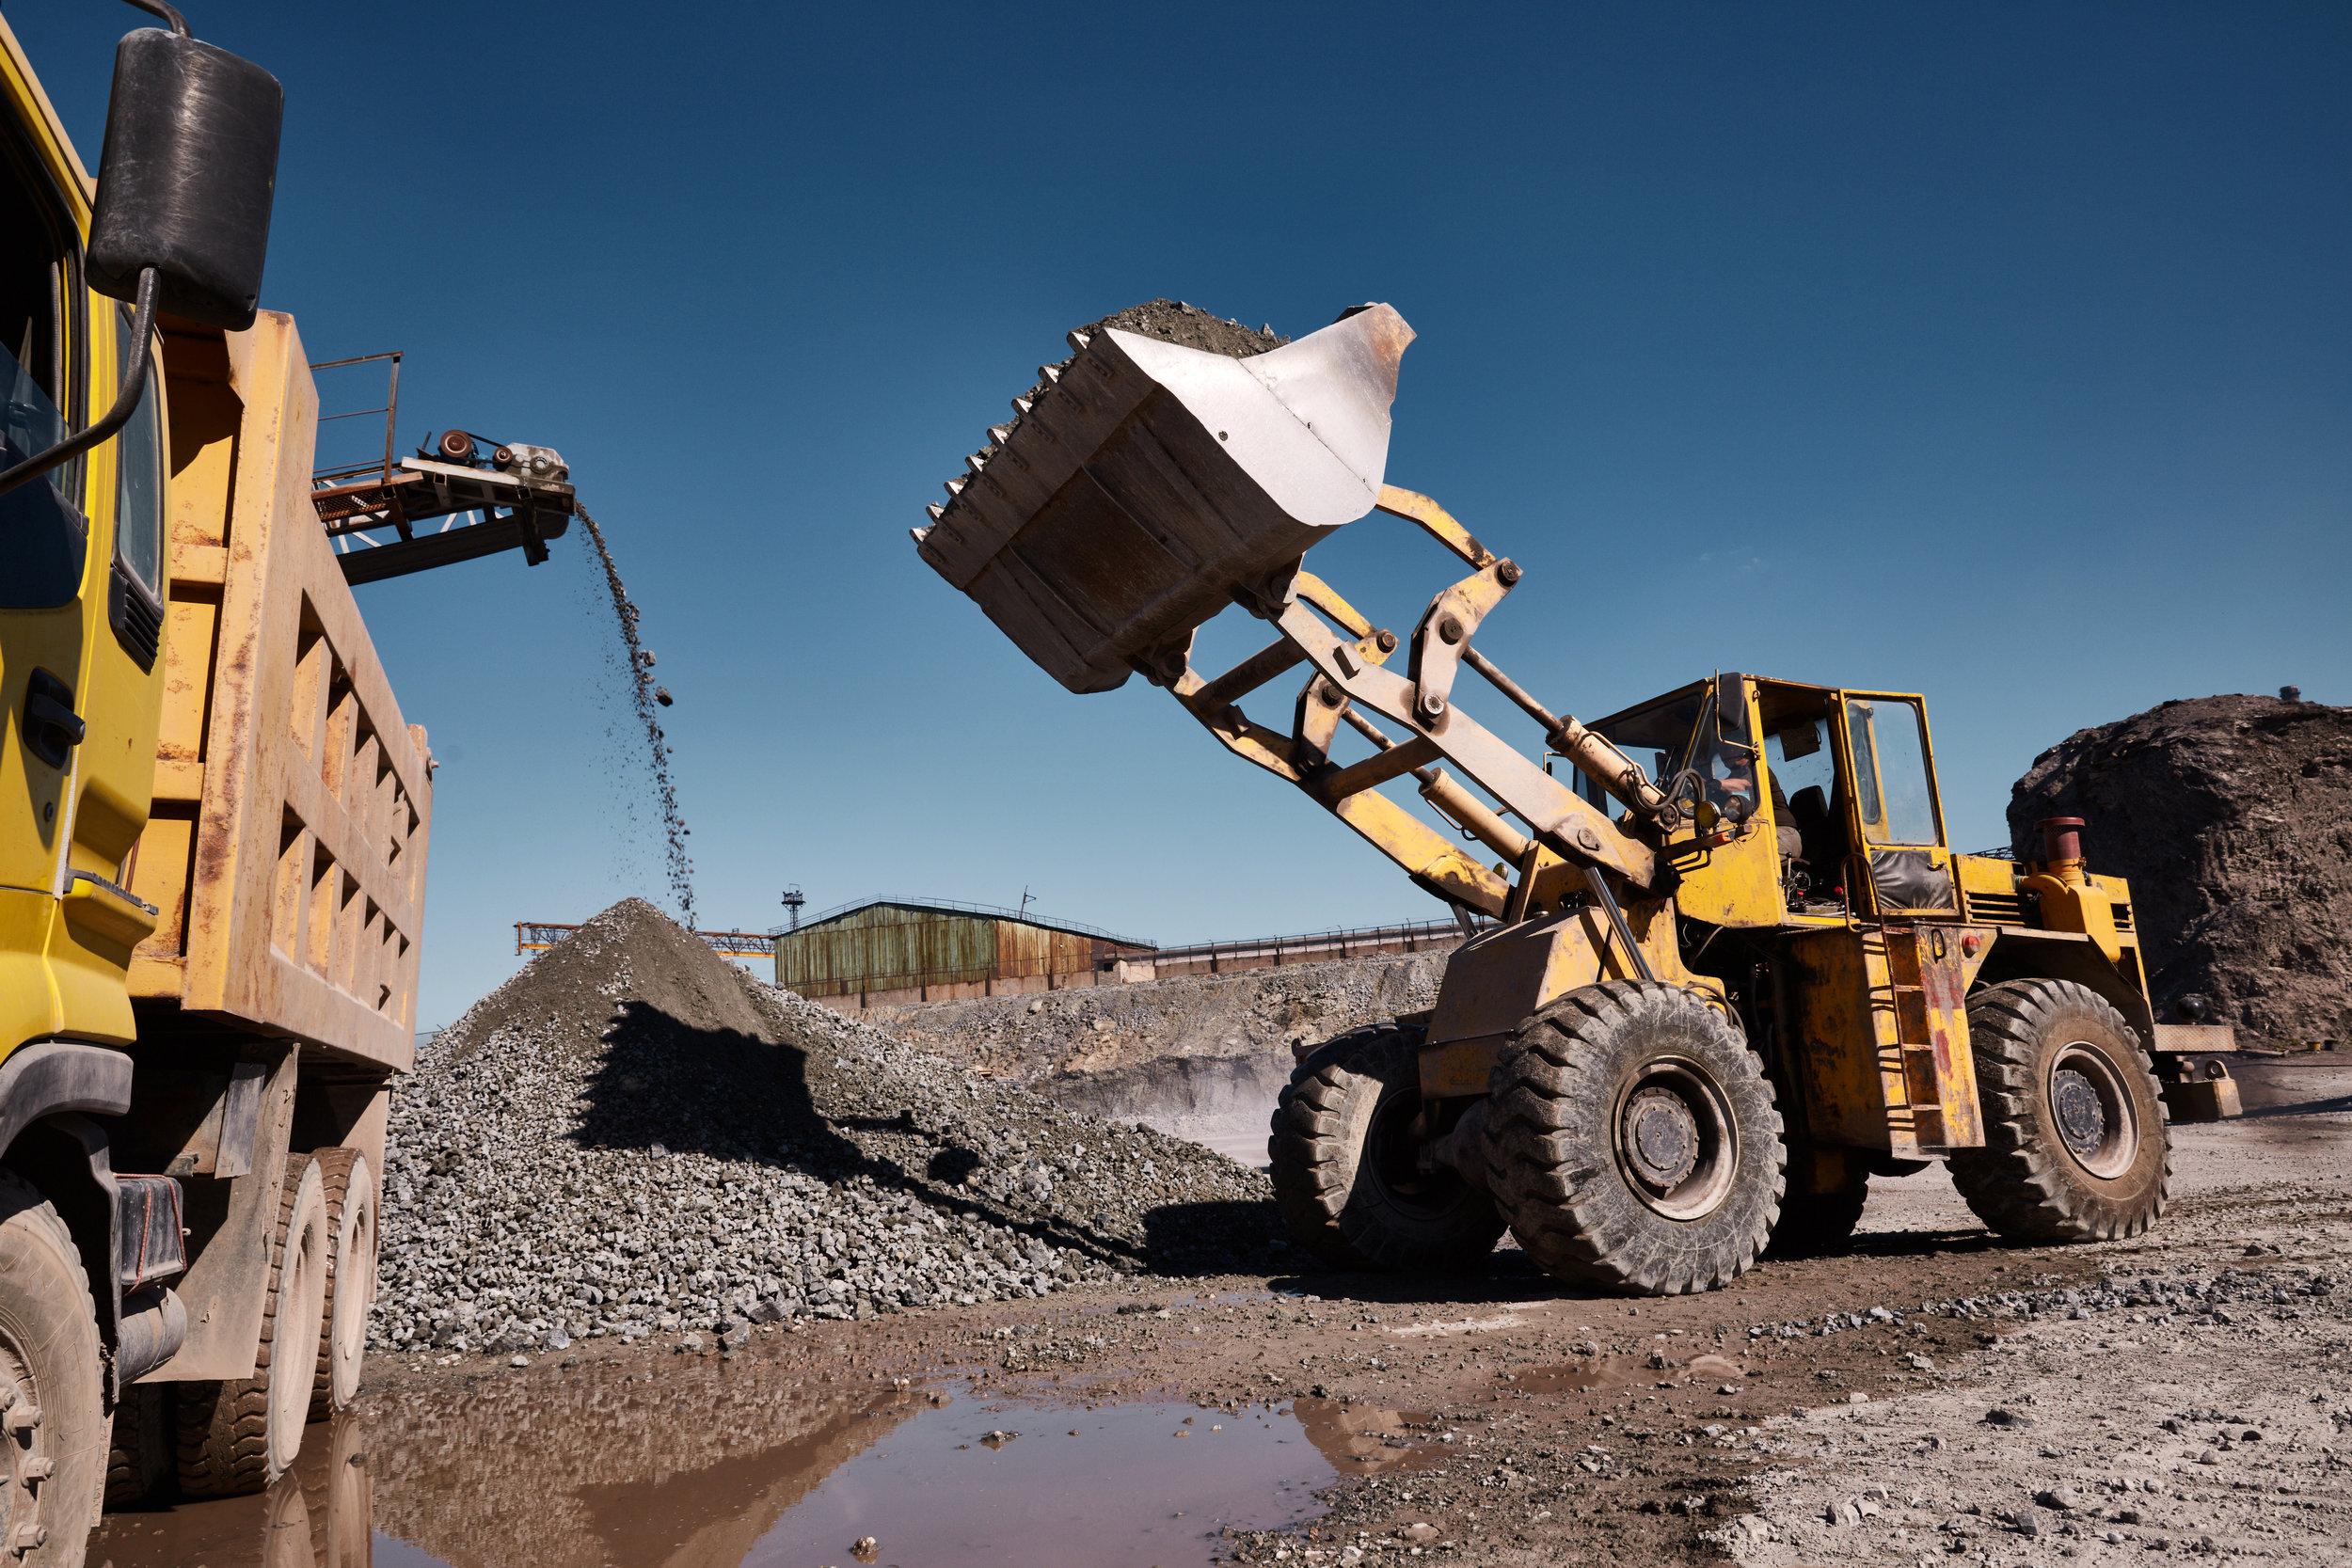 front-loading-excavator-loading-the-truck-D9KFVE8.jpg